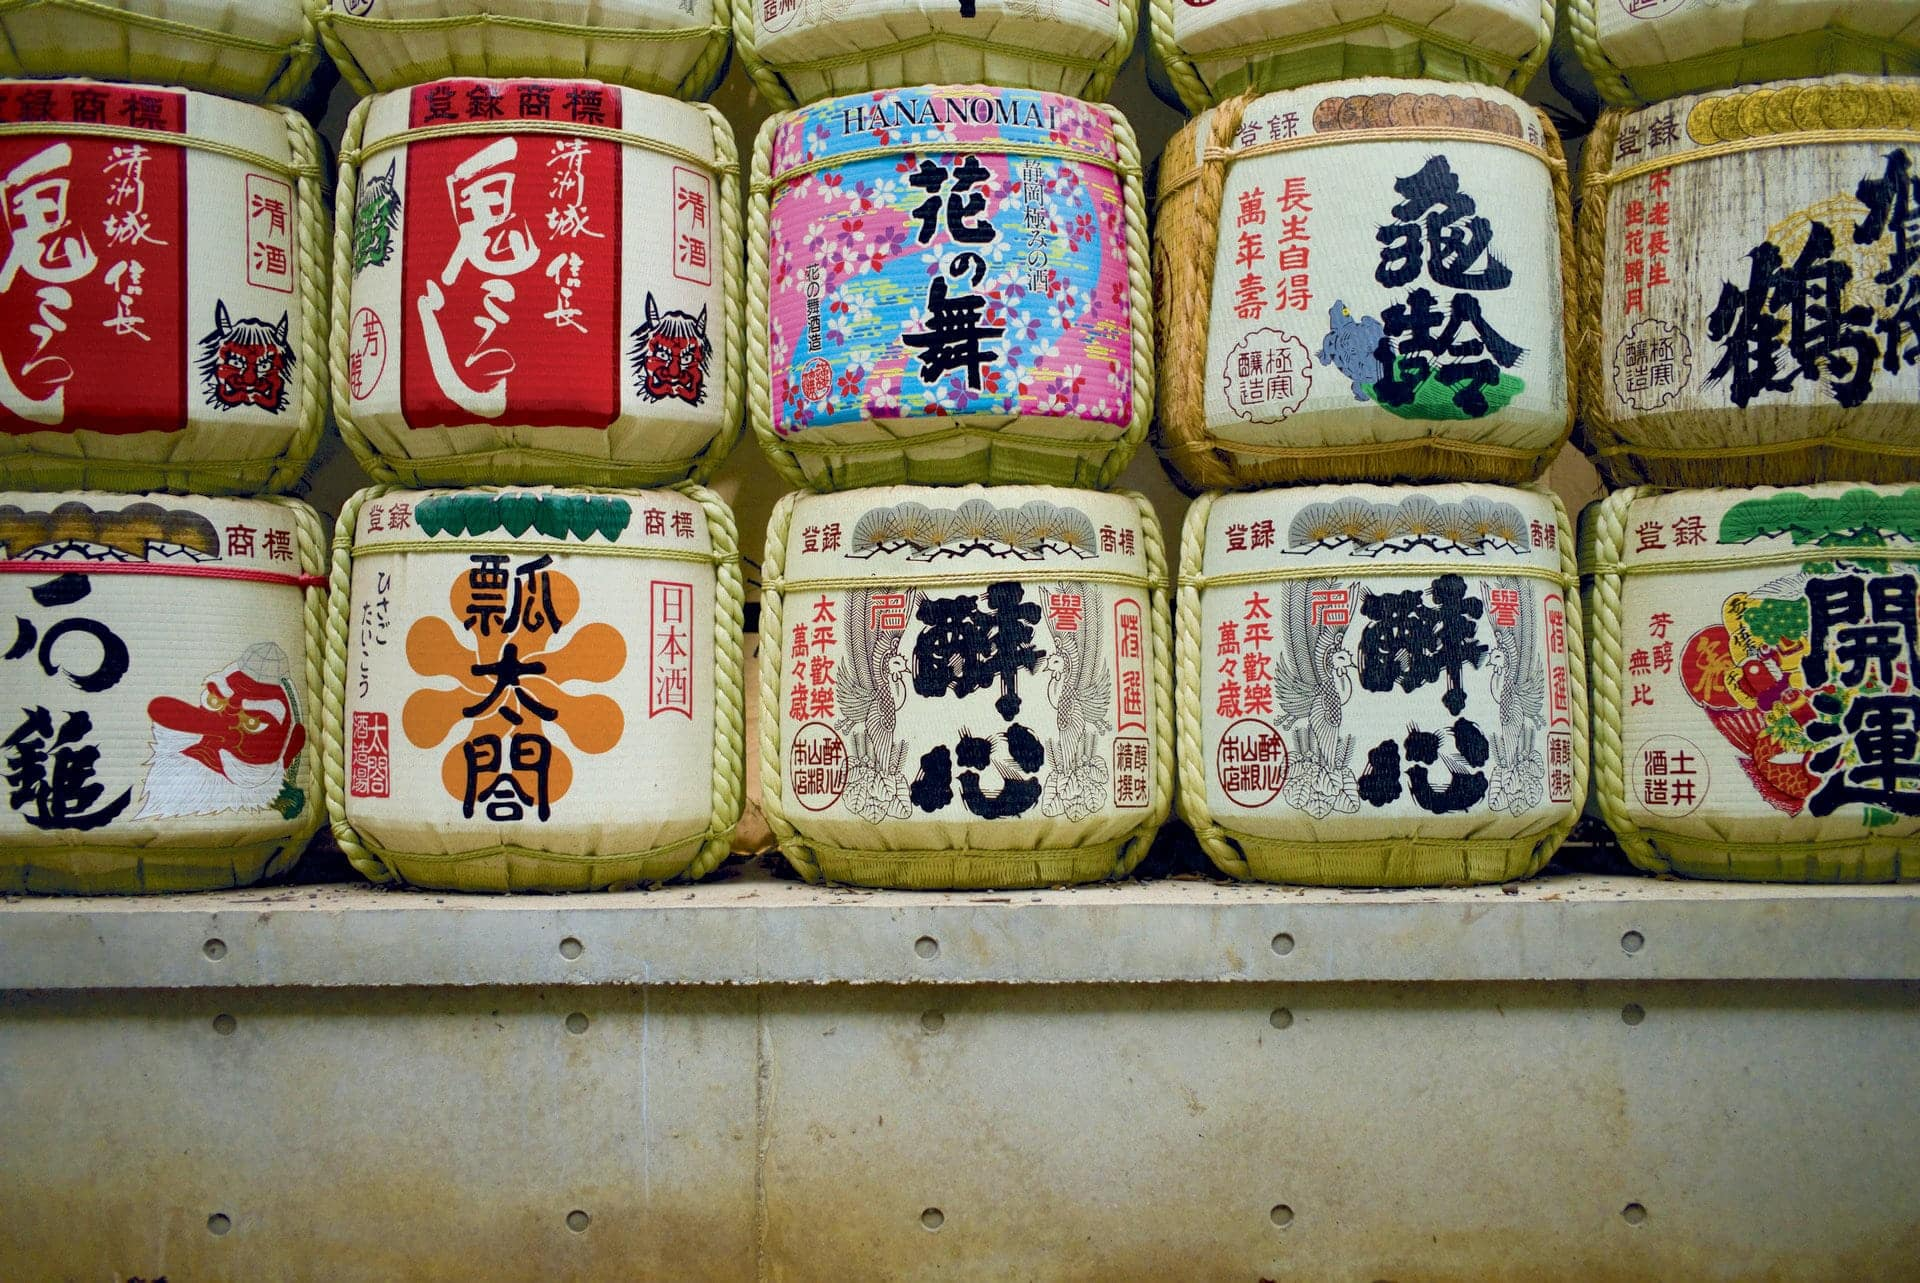 Silvia Giovanardi / life / Honeymoon in Japan